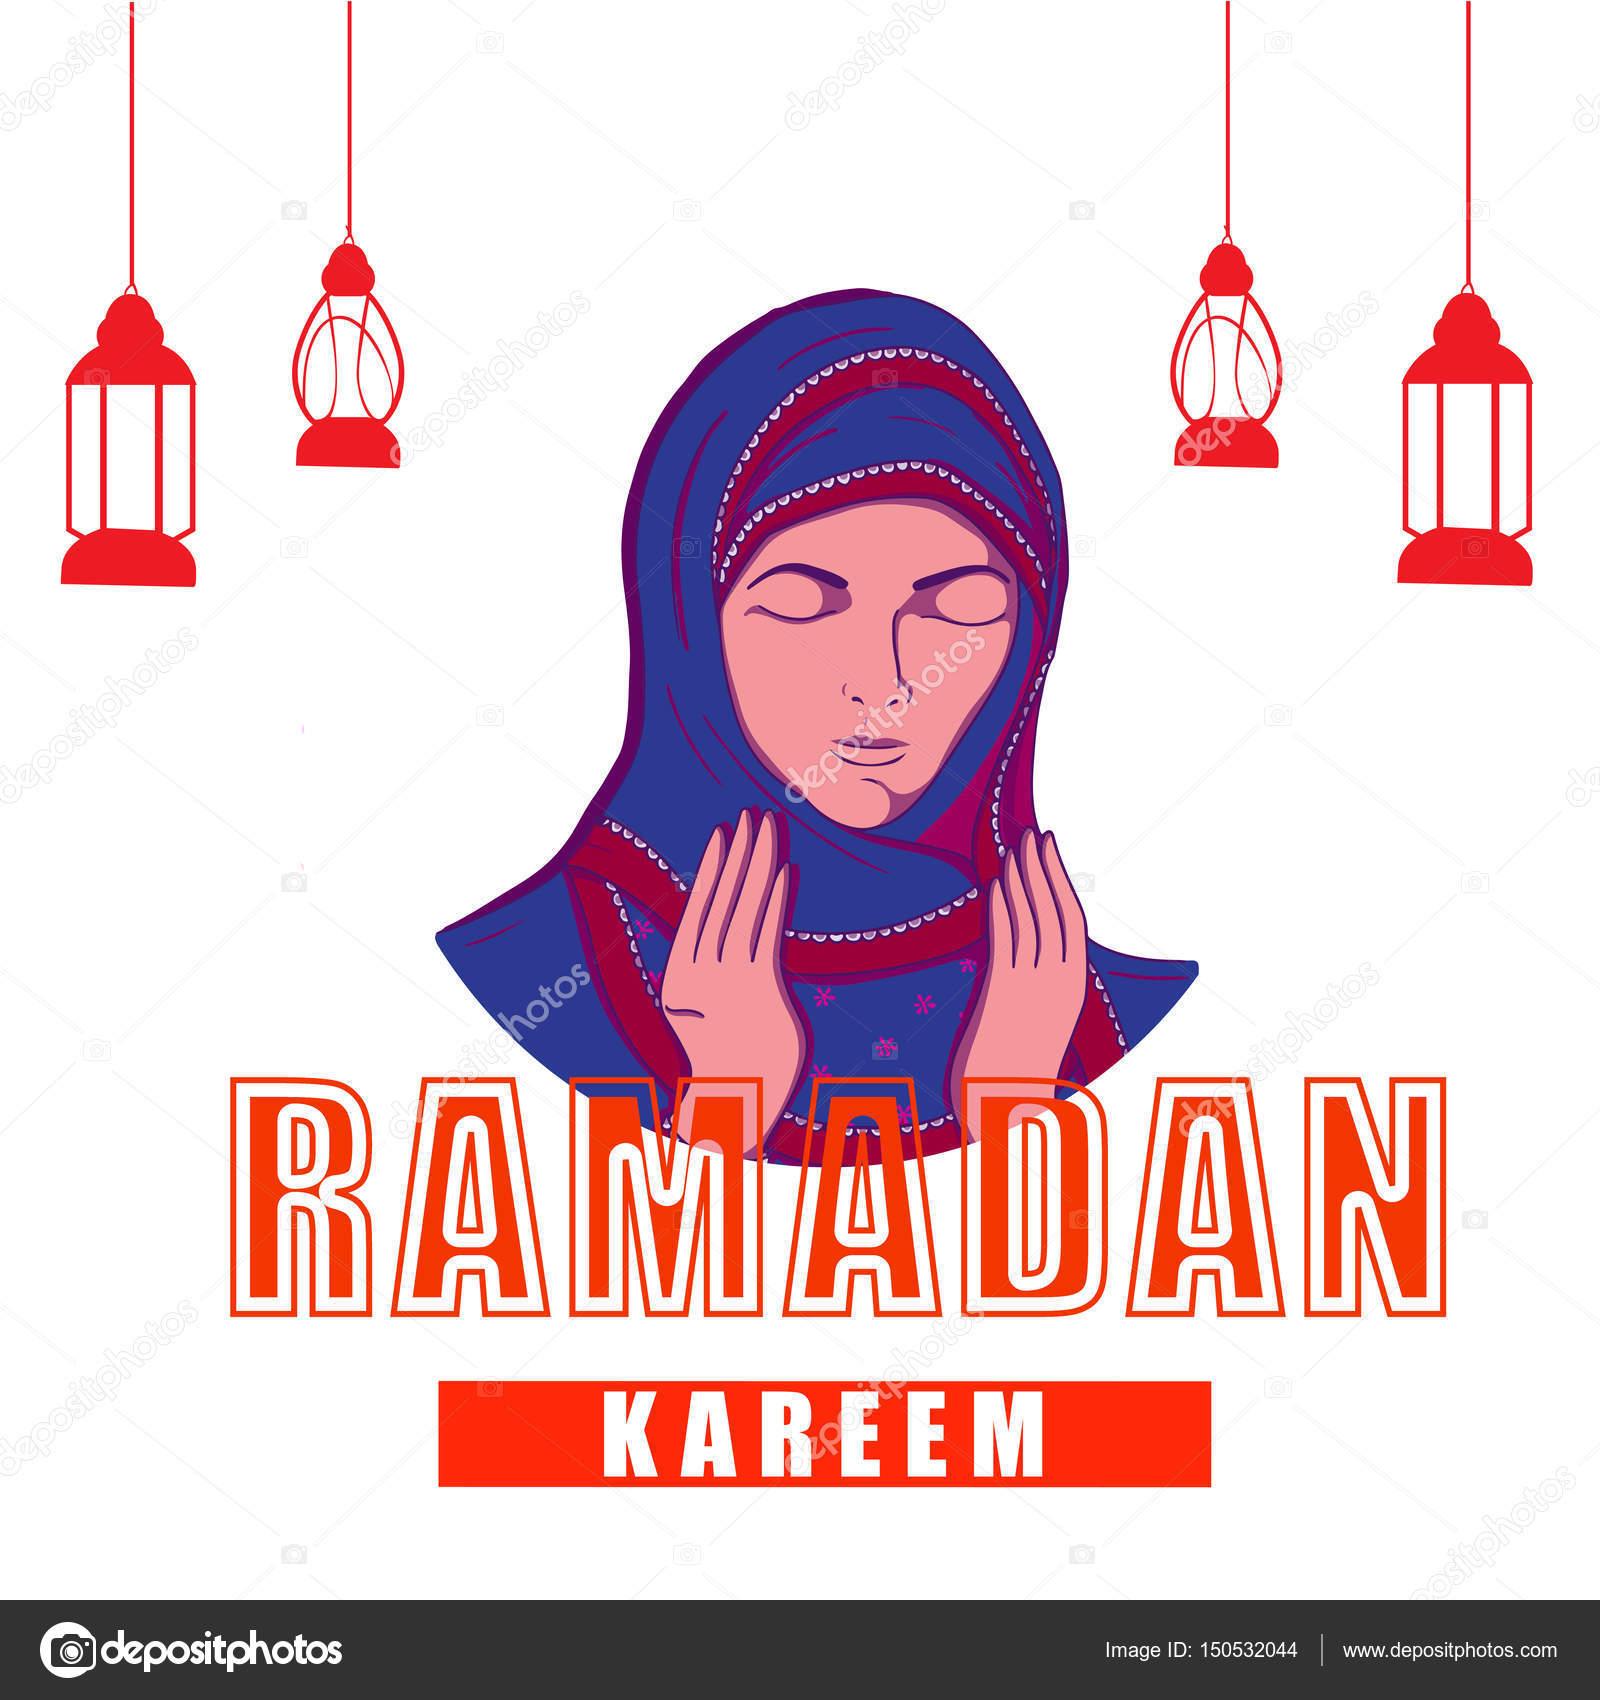 Greeting Card with Praying Woman for Ramadan Kareem  — Stock Vector